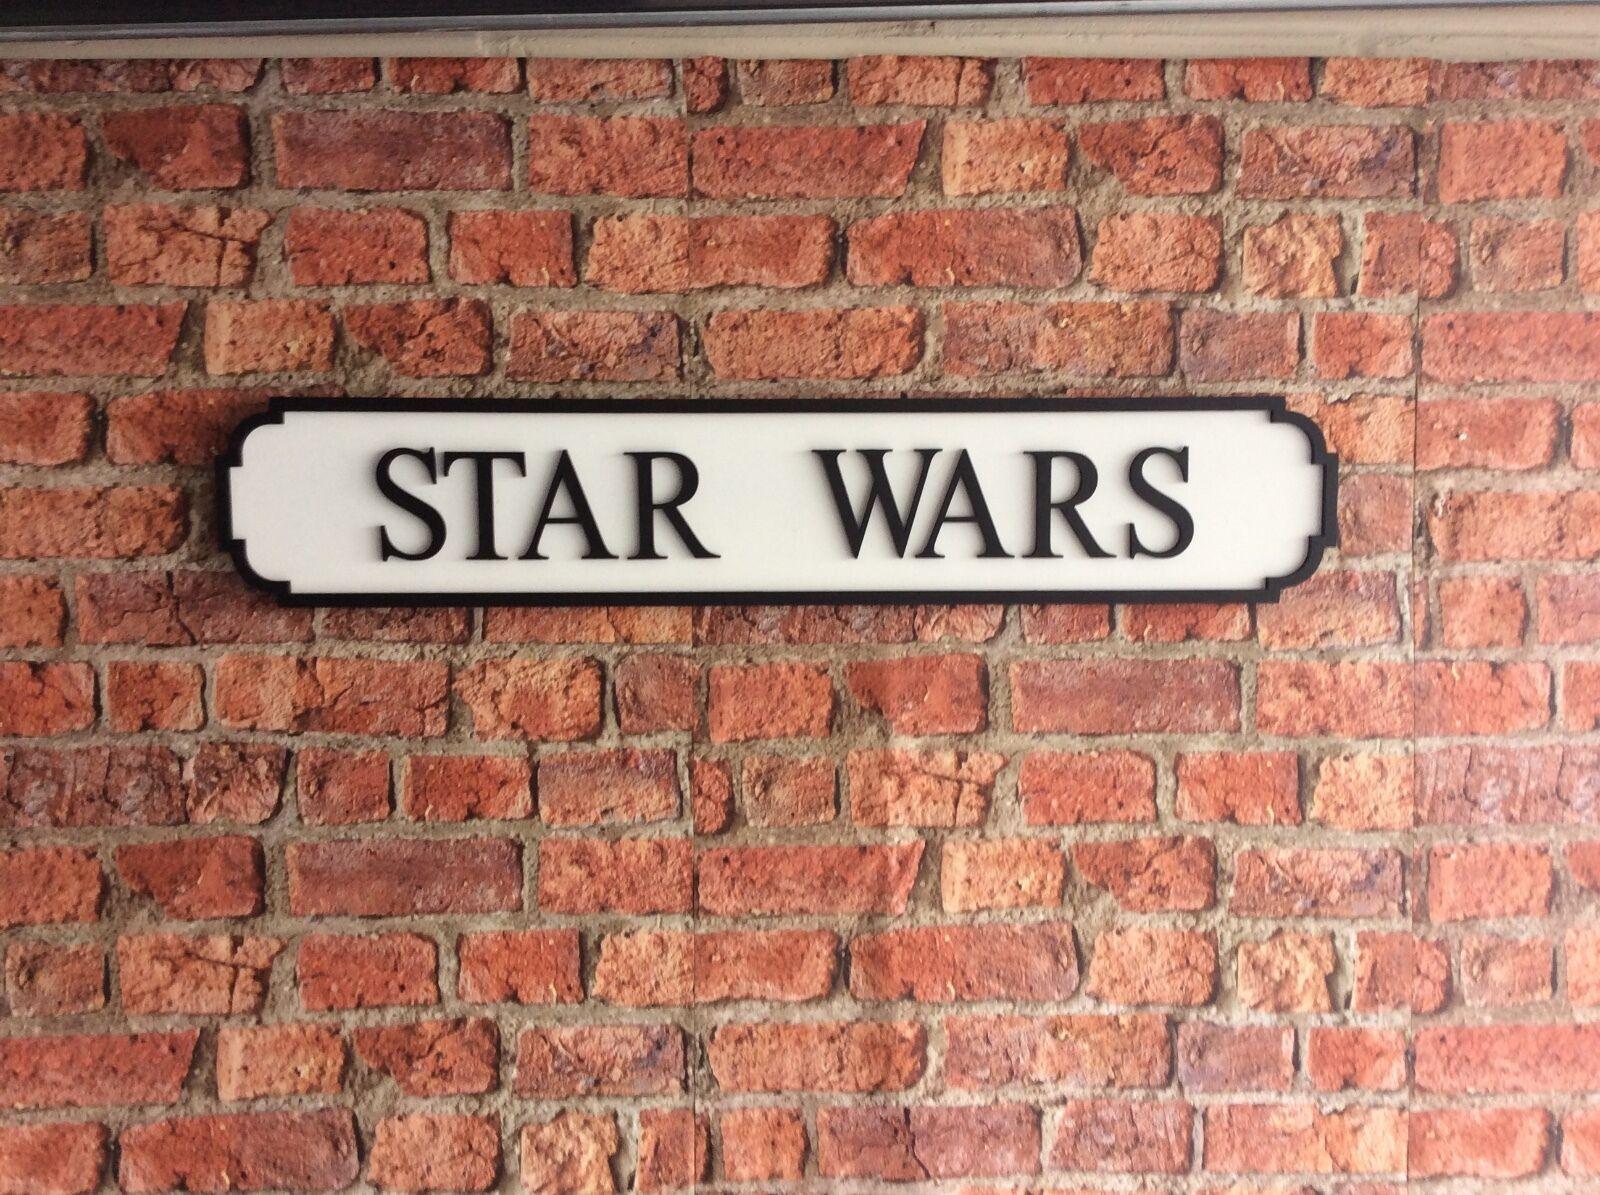 STAR WARS Vintage London Wood Street Road Sign